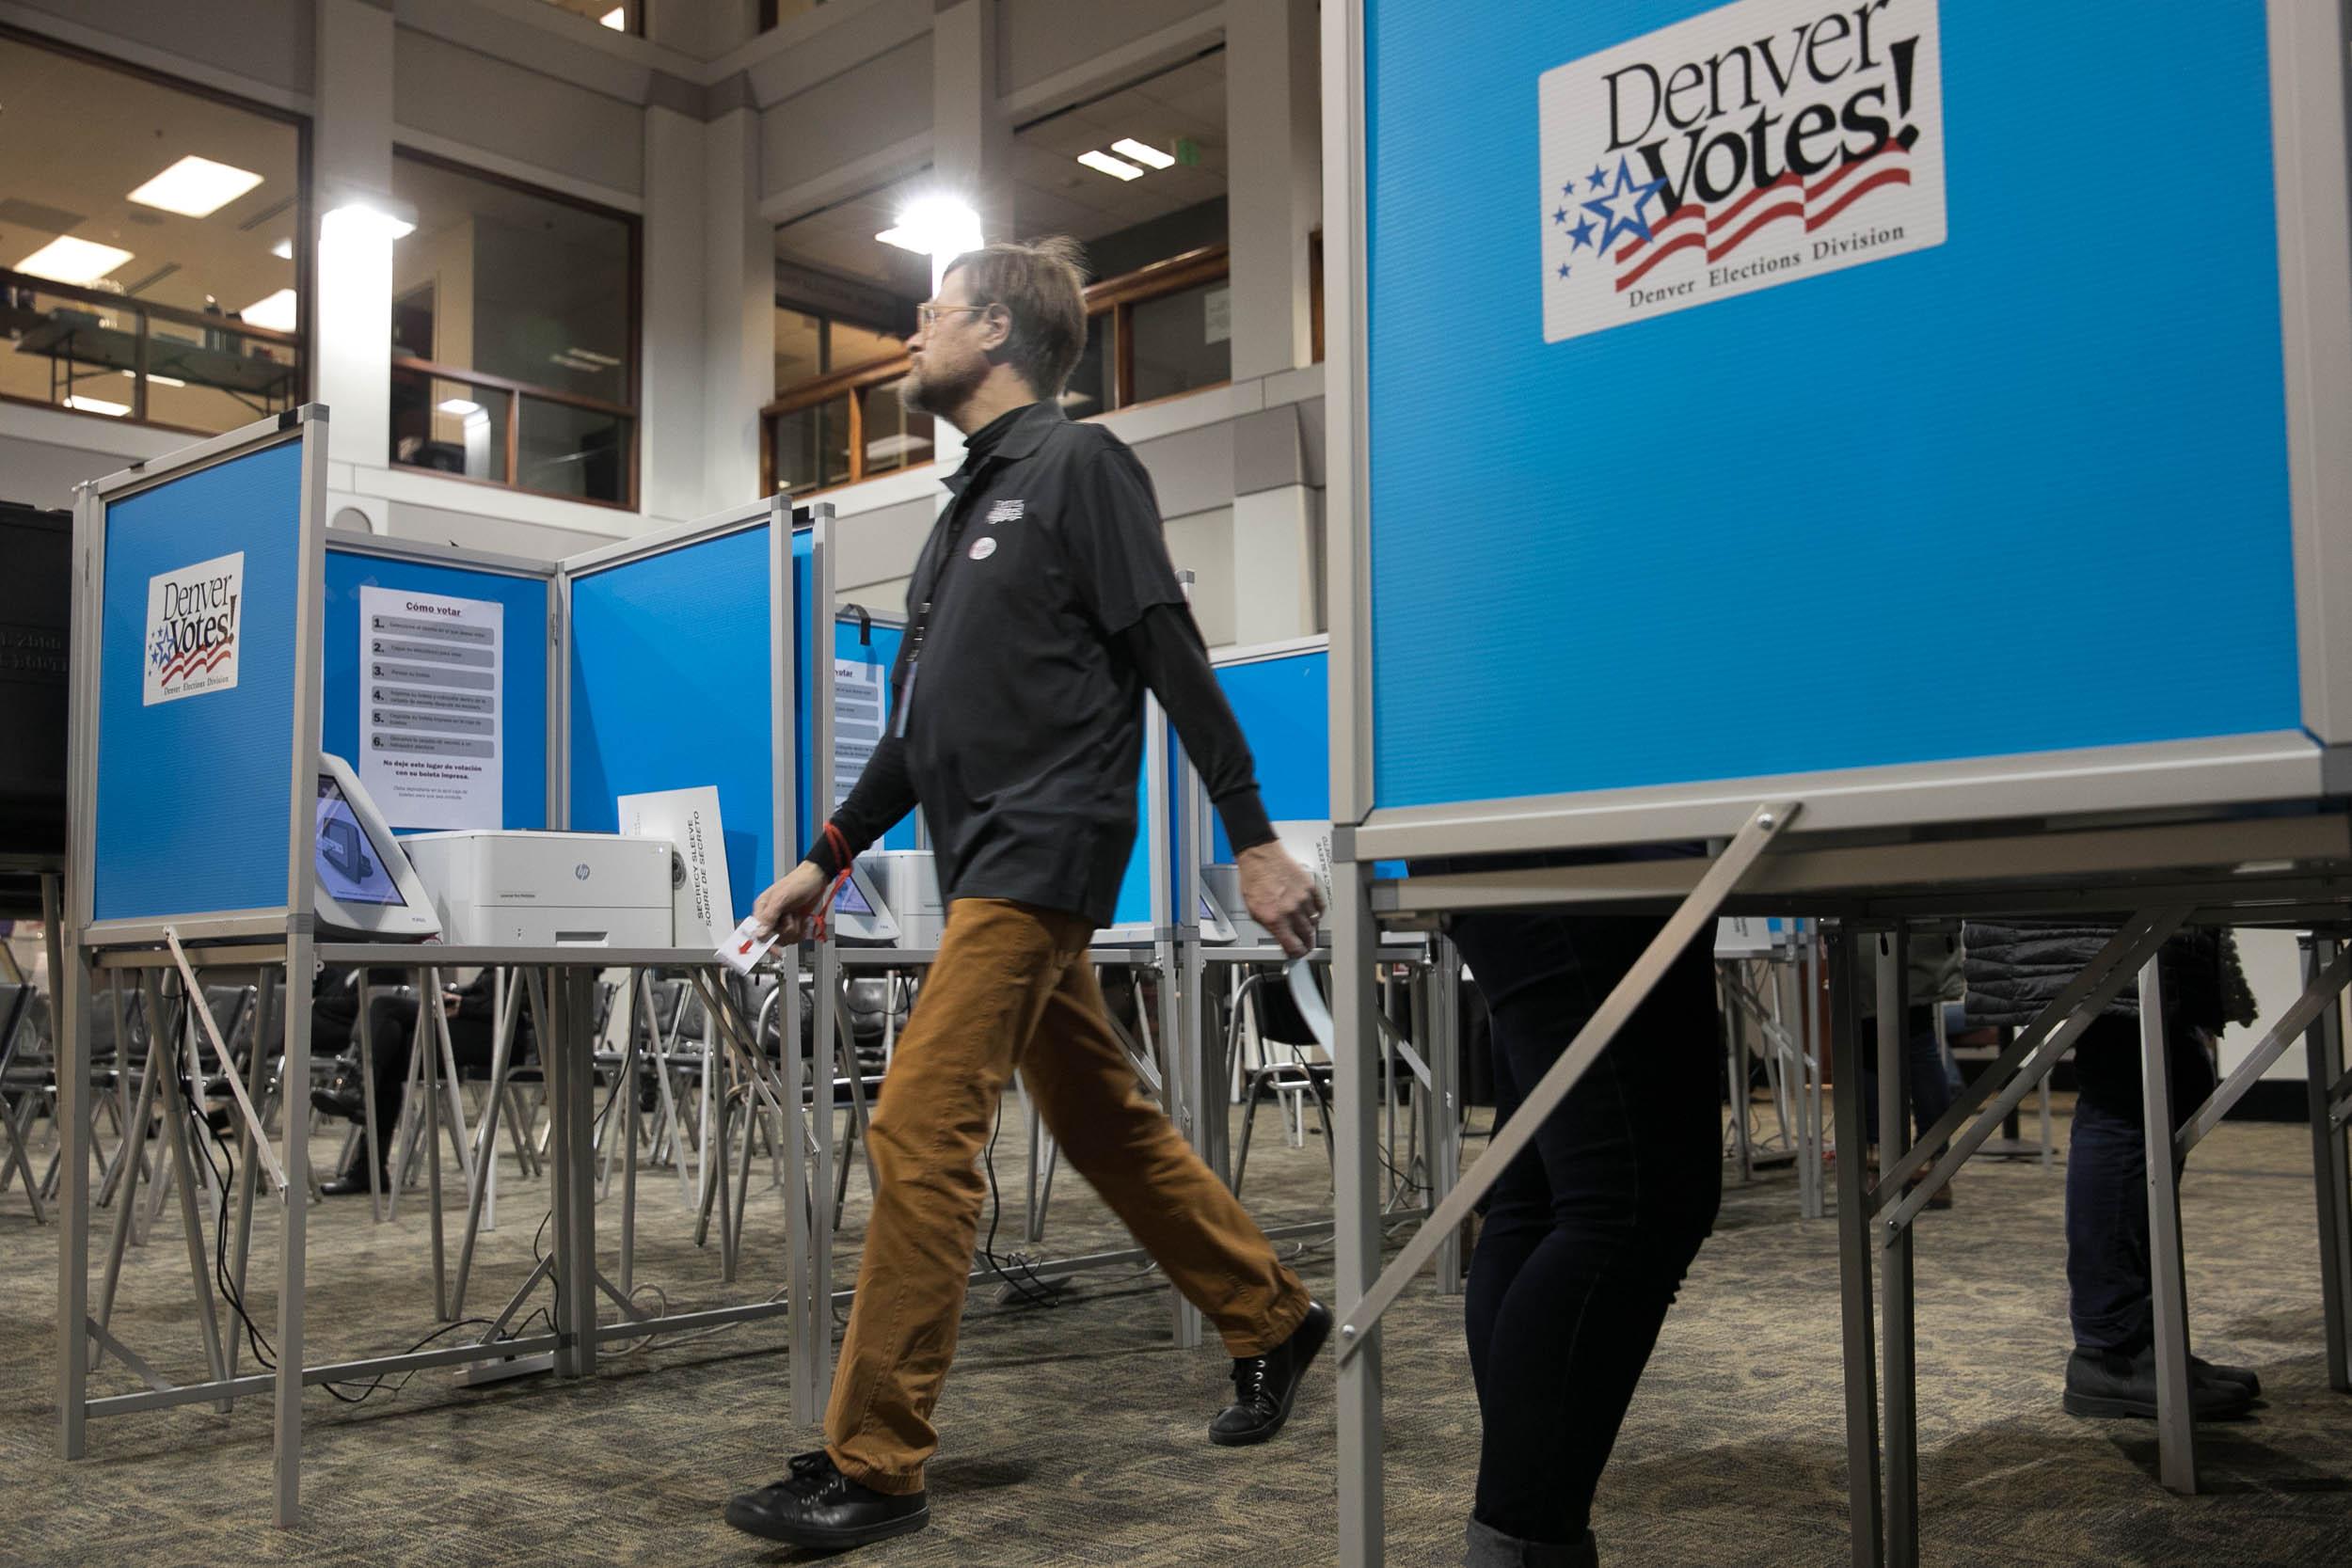 191105 ELECTION DAY PM VOTING DENVER